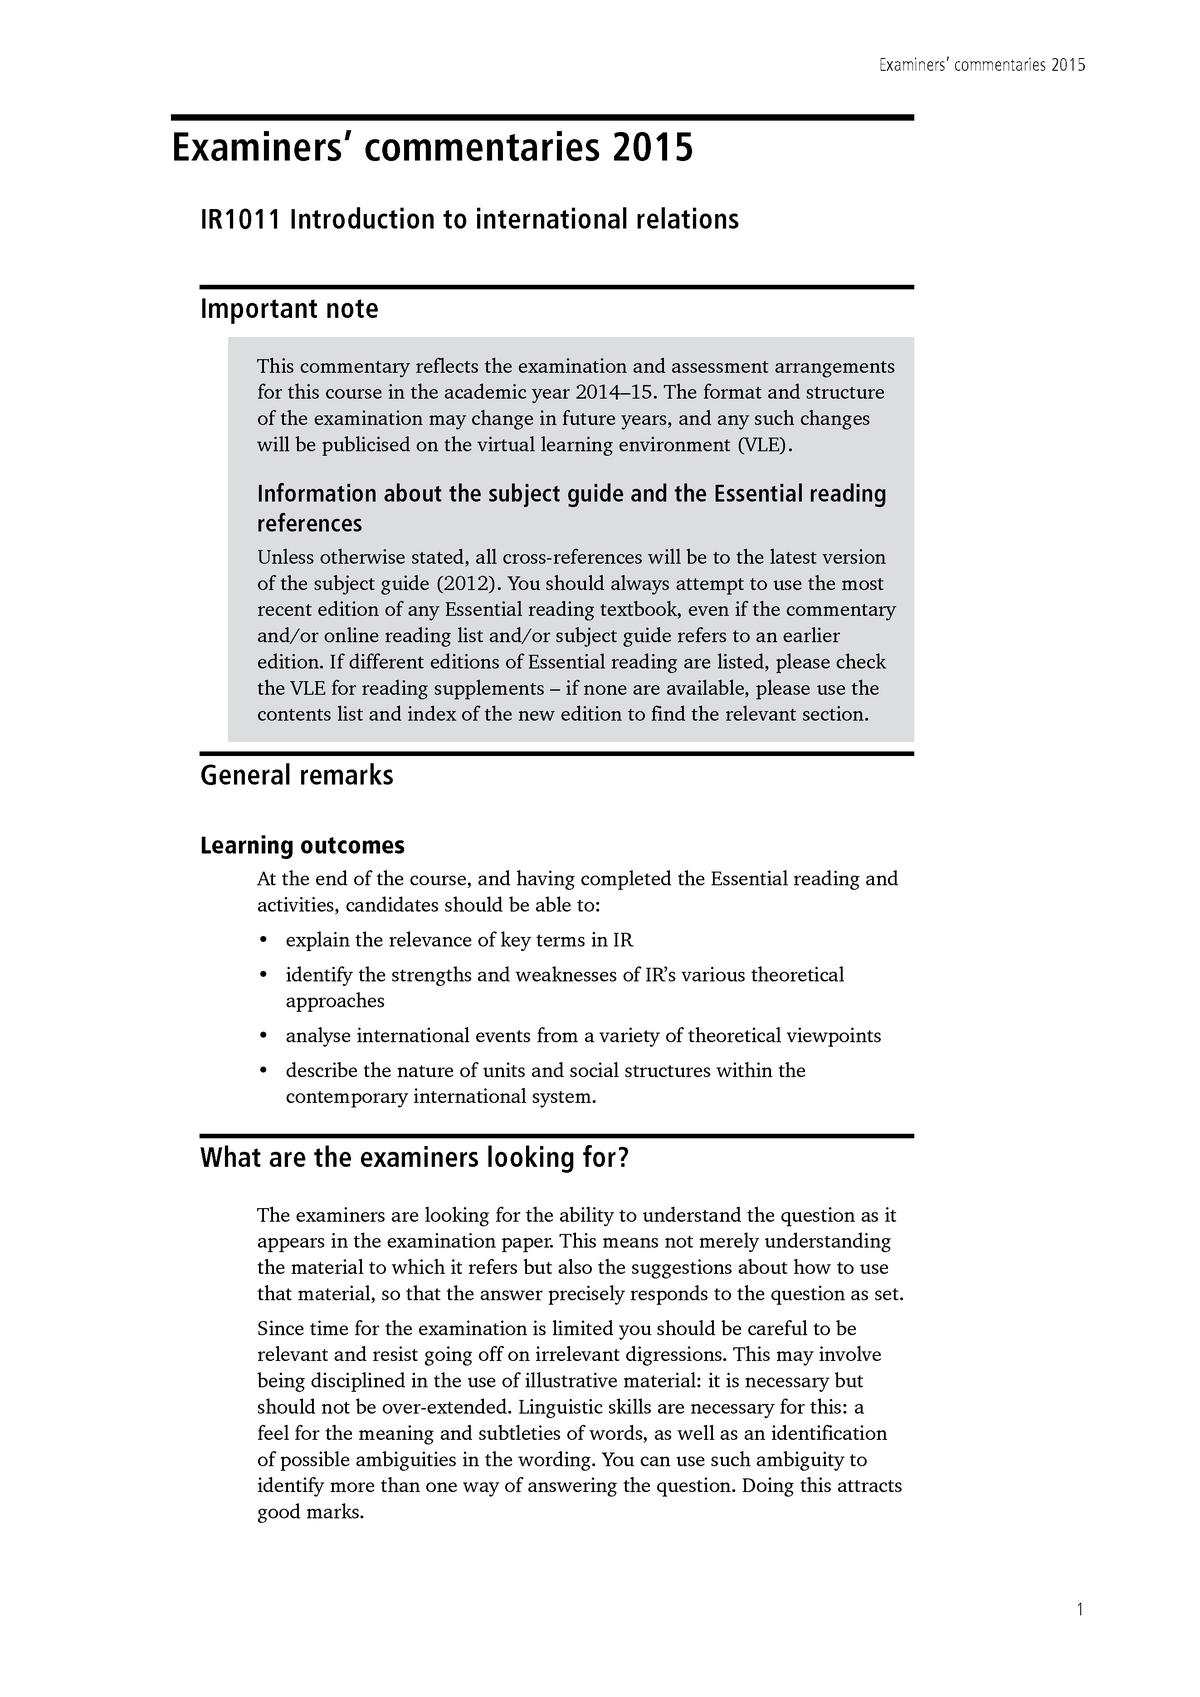 Exam 2015, questions and answers - IR1011 - London - StuDocu